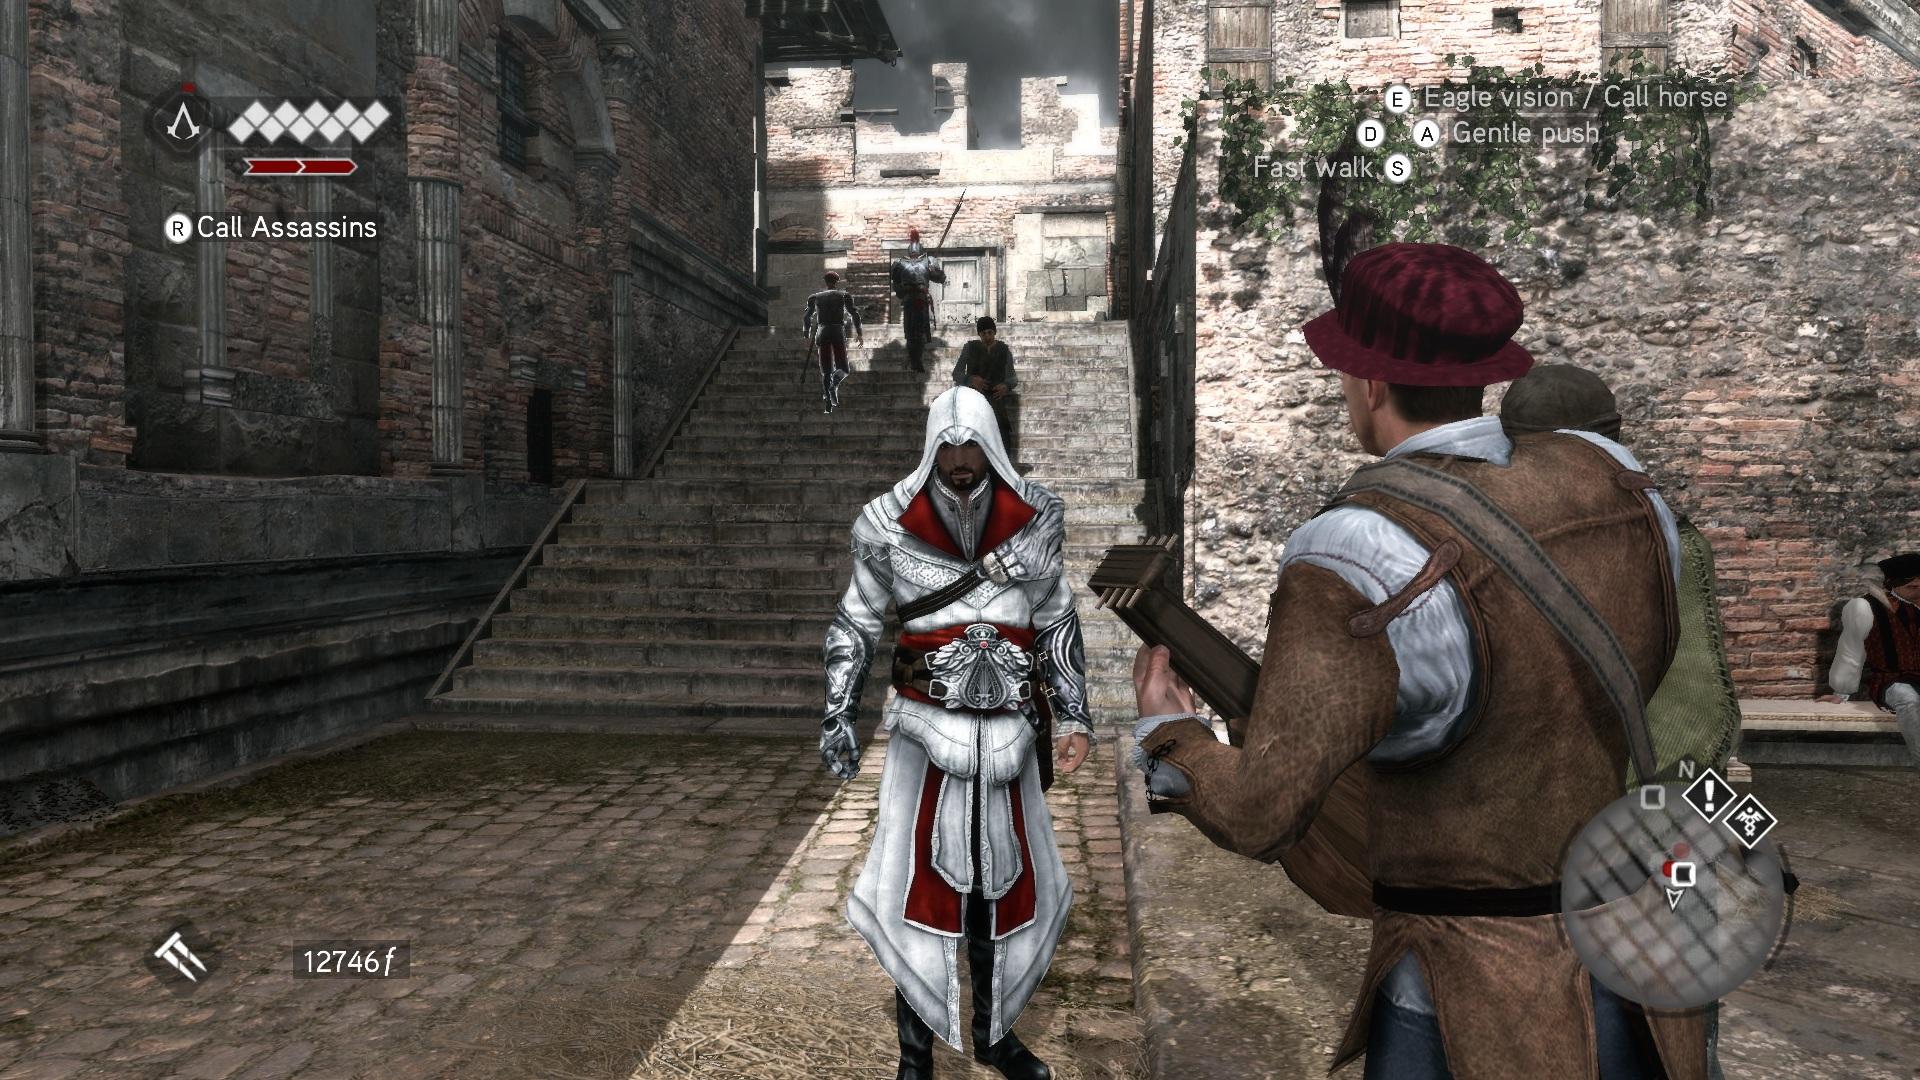 Скачать моды на assassins creed brotherhood